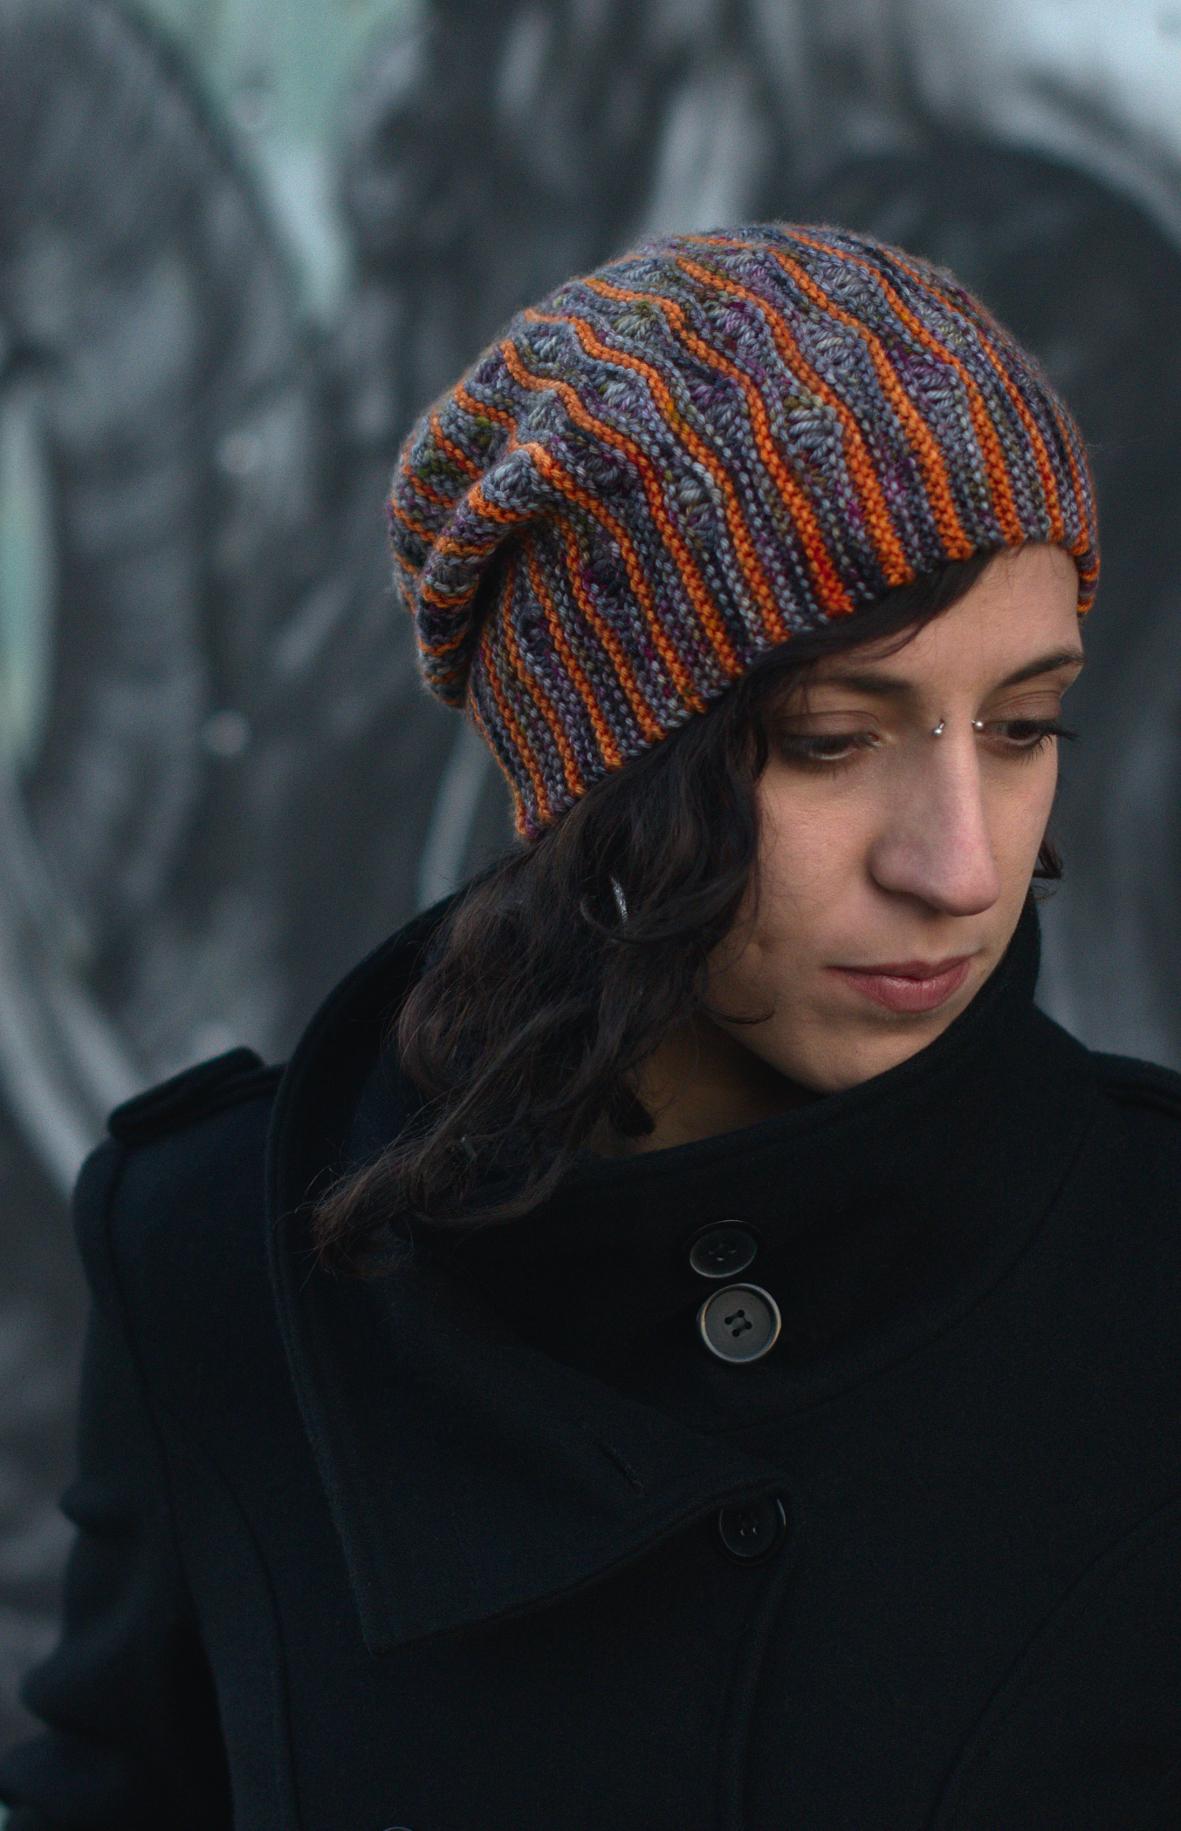 Laminard sideways knit stripe and drop stitch colourwork Hat hand knitting pattern for DK yarn